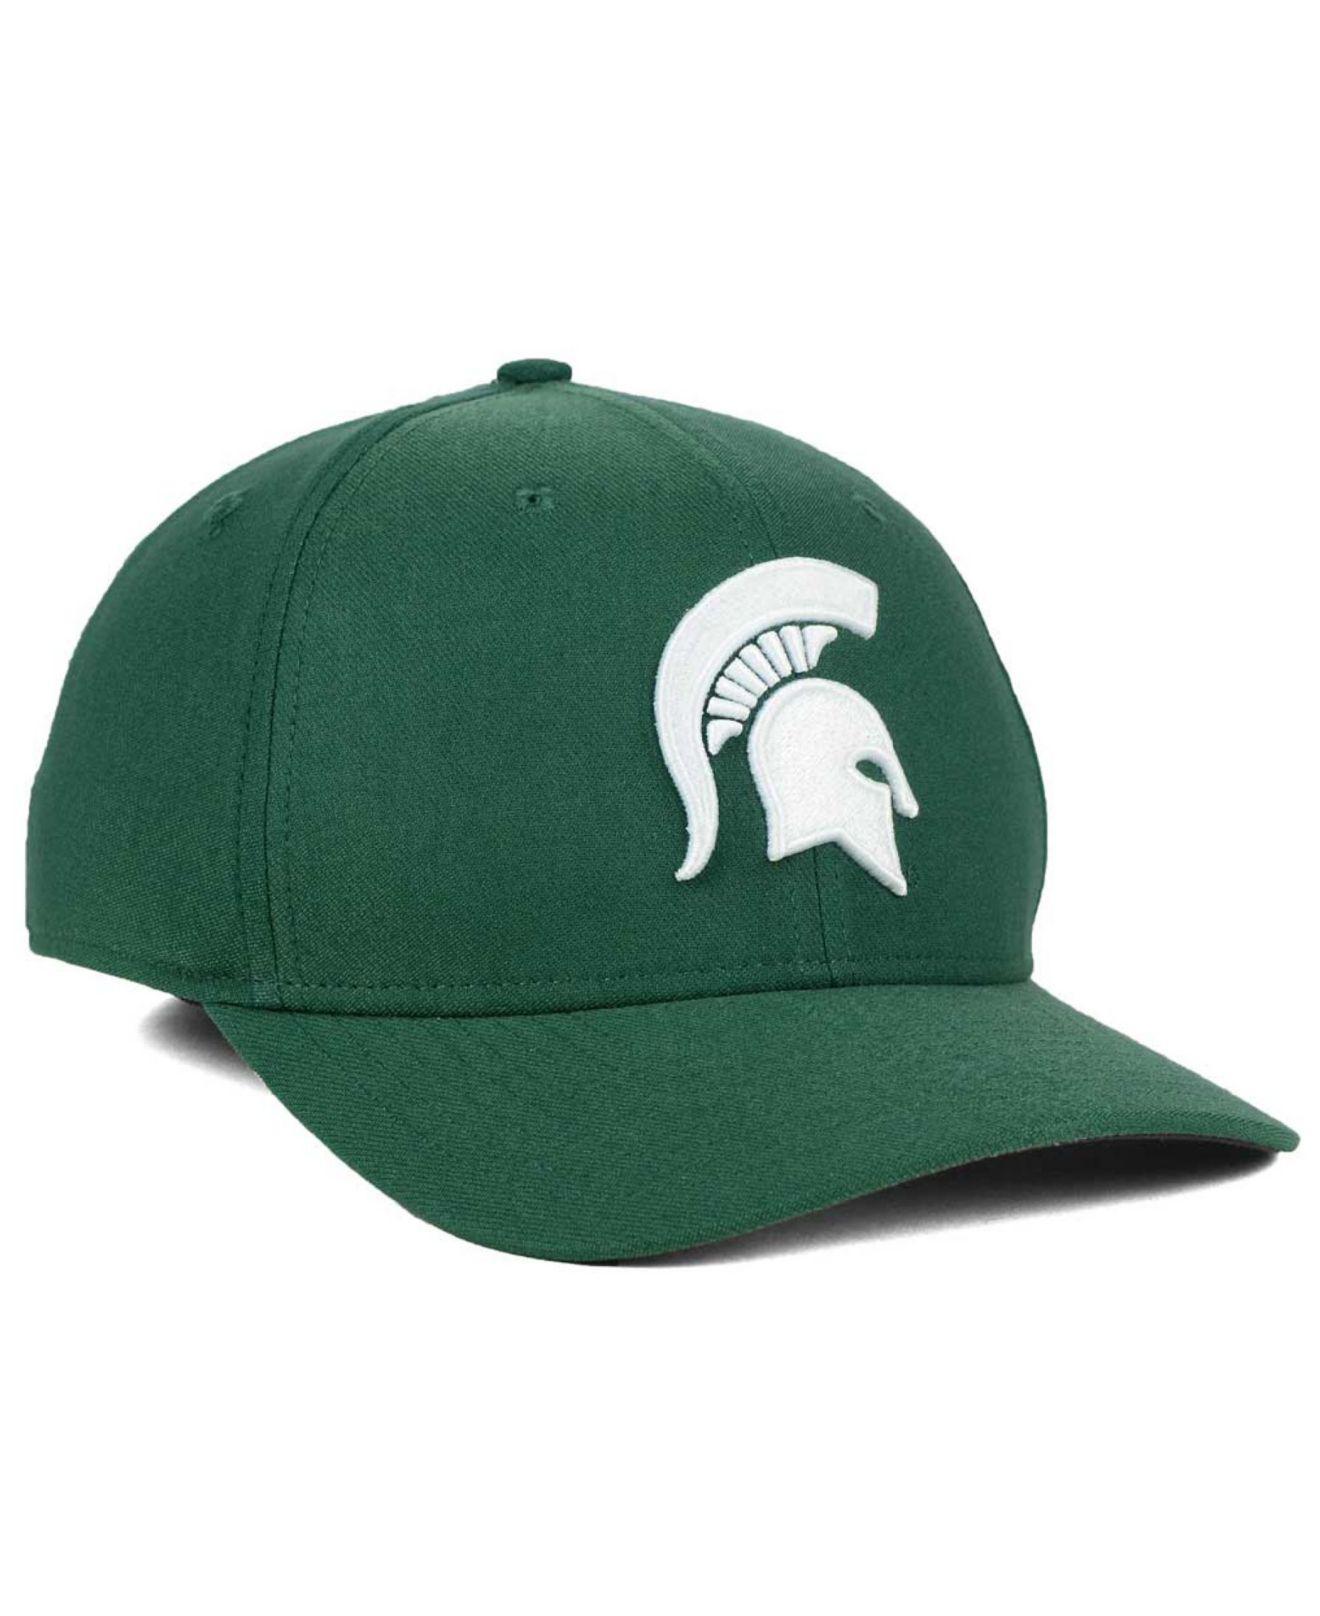 half off 58c97 8657b ... Michigan State Spartans Classic Swoosh Cap for Men - Lyst. View  fullscreen